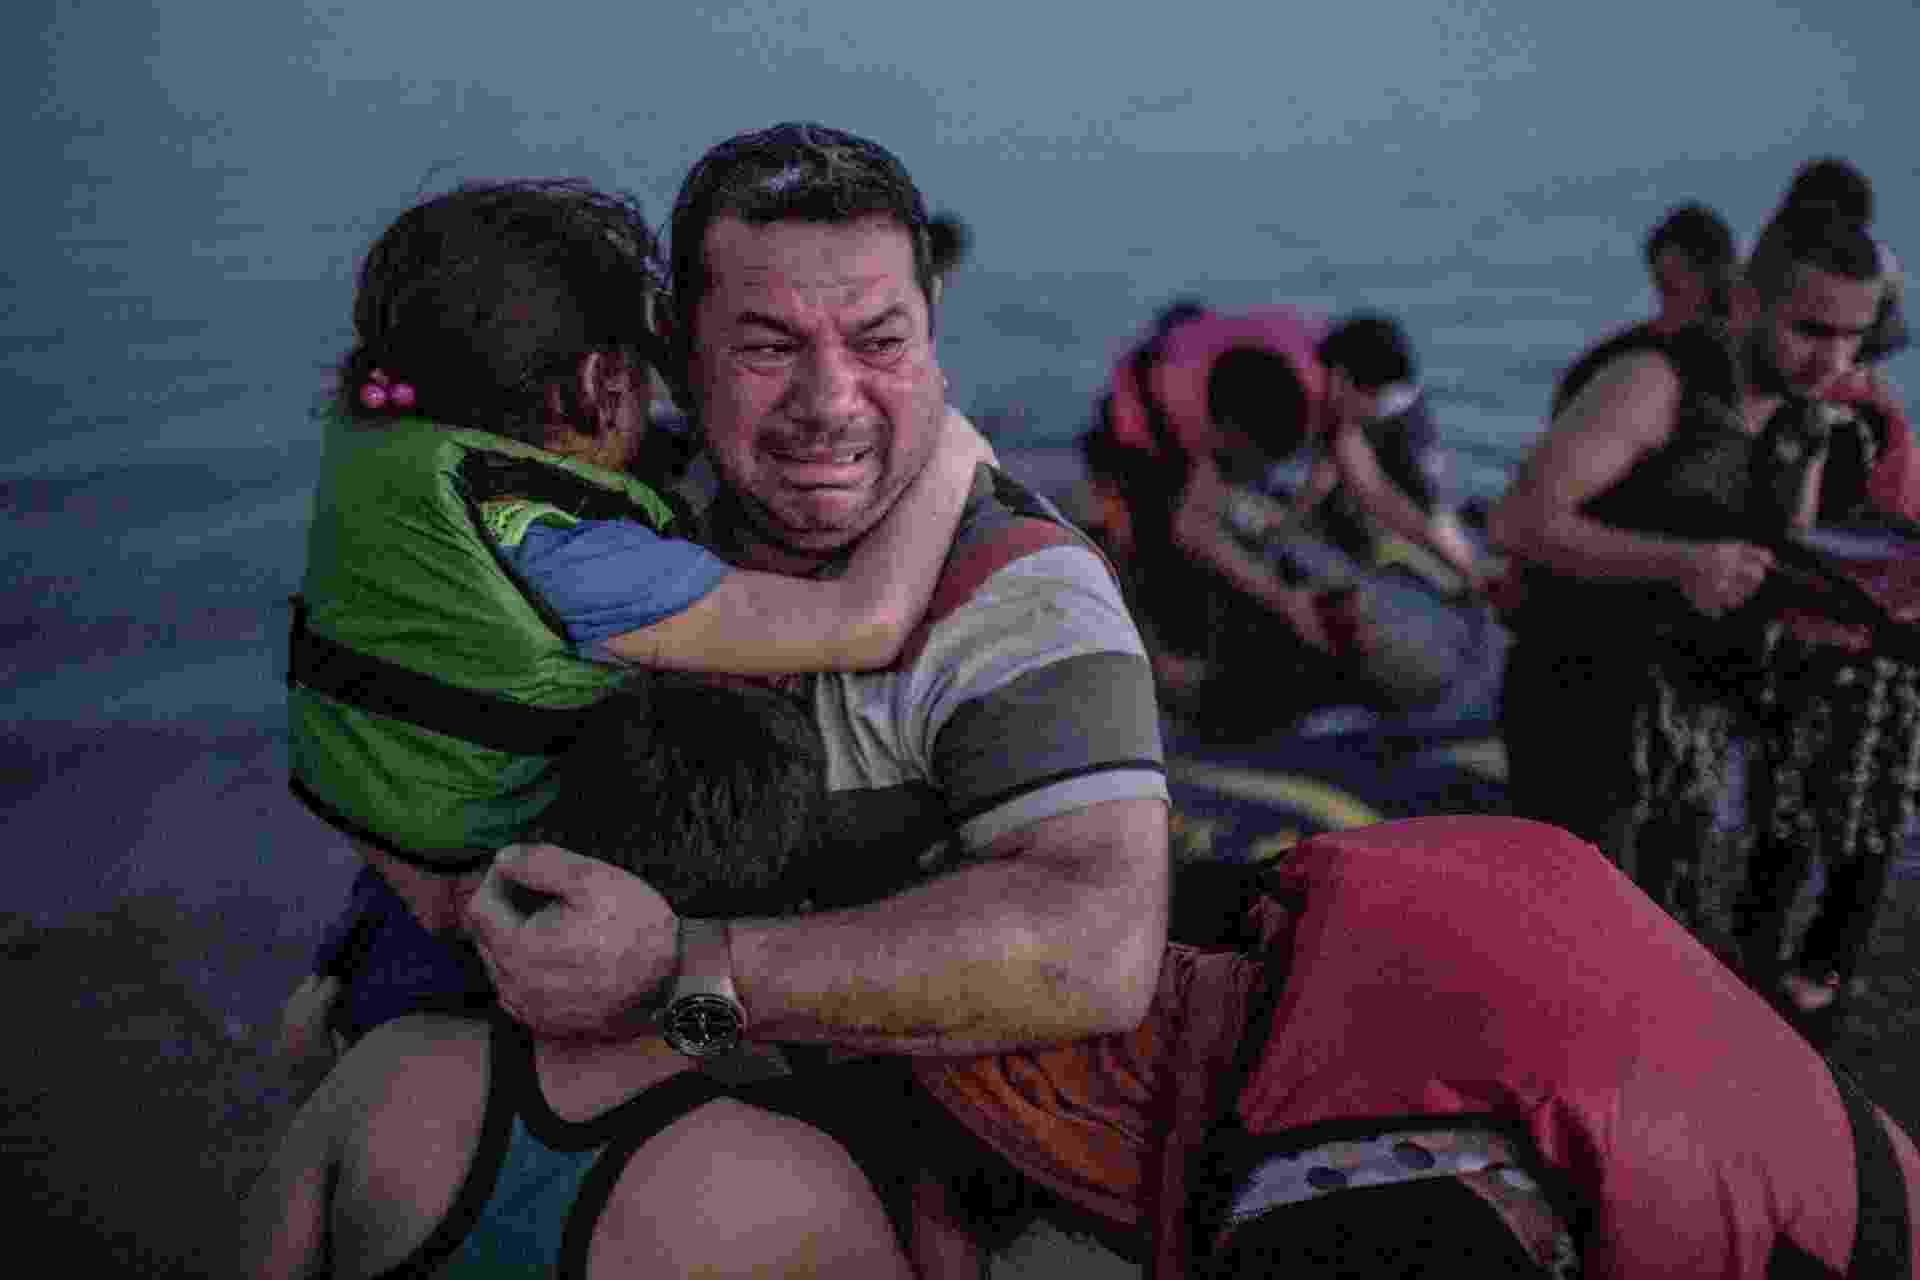 Família síria se abraça emocionada após desembarcar viva na ilha de Kos, na Grécia - Daniel Etter/The New York Times